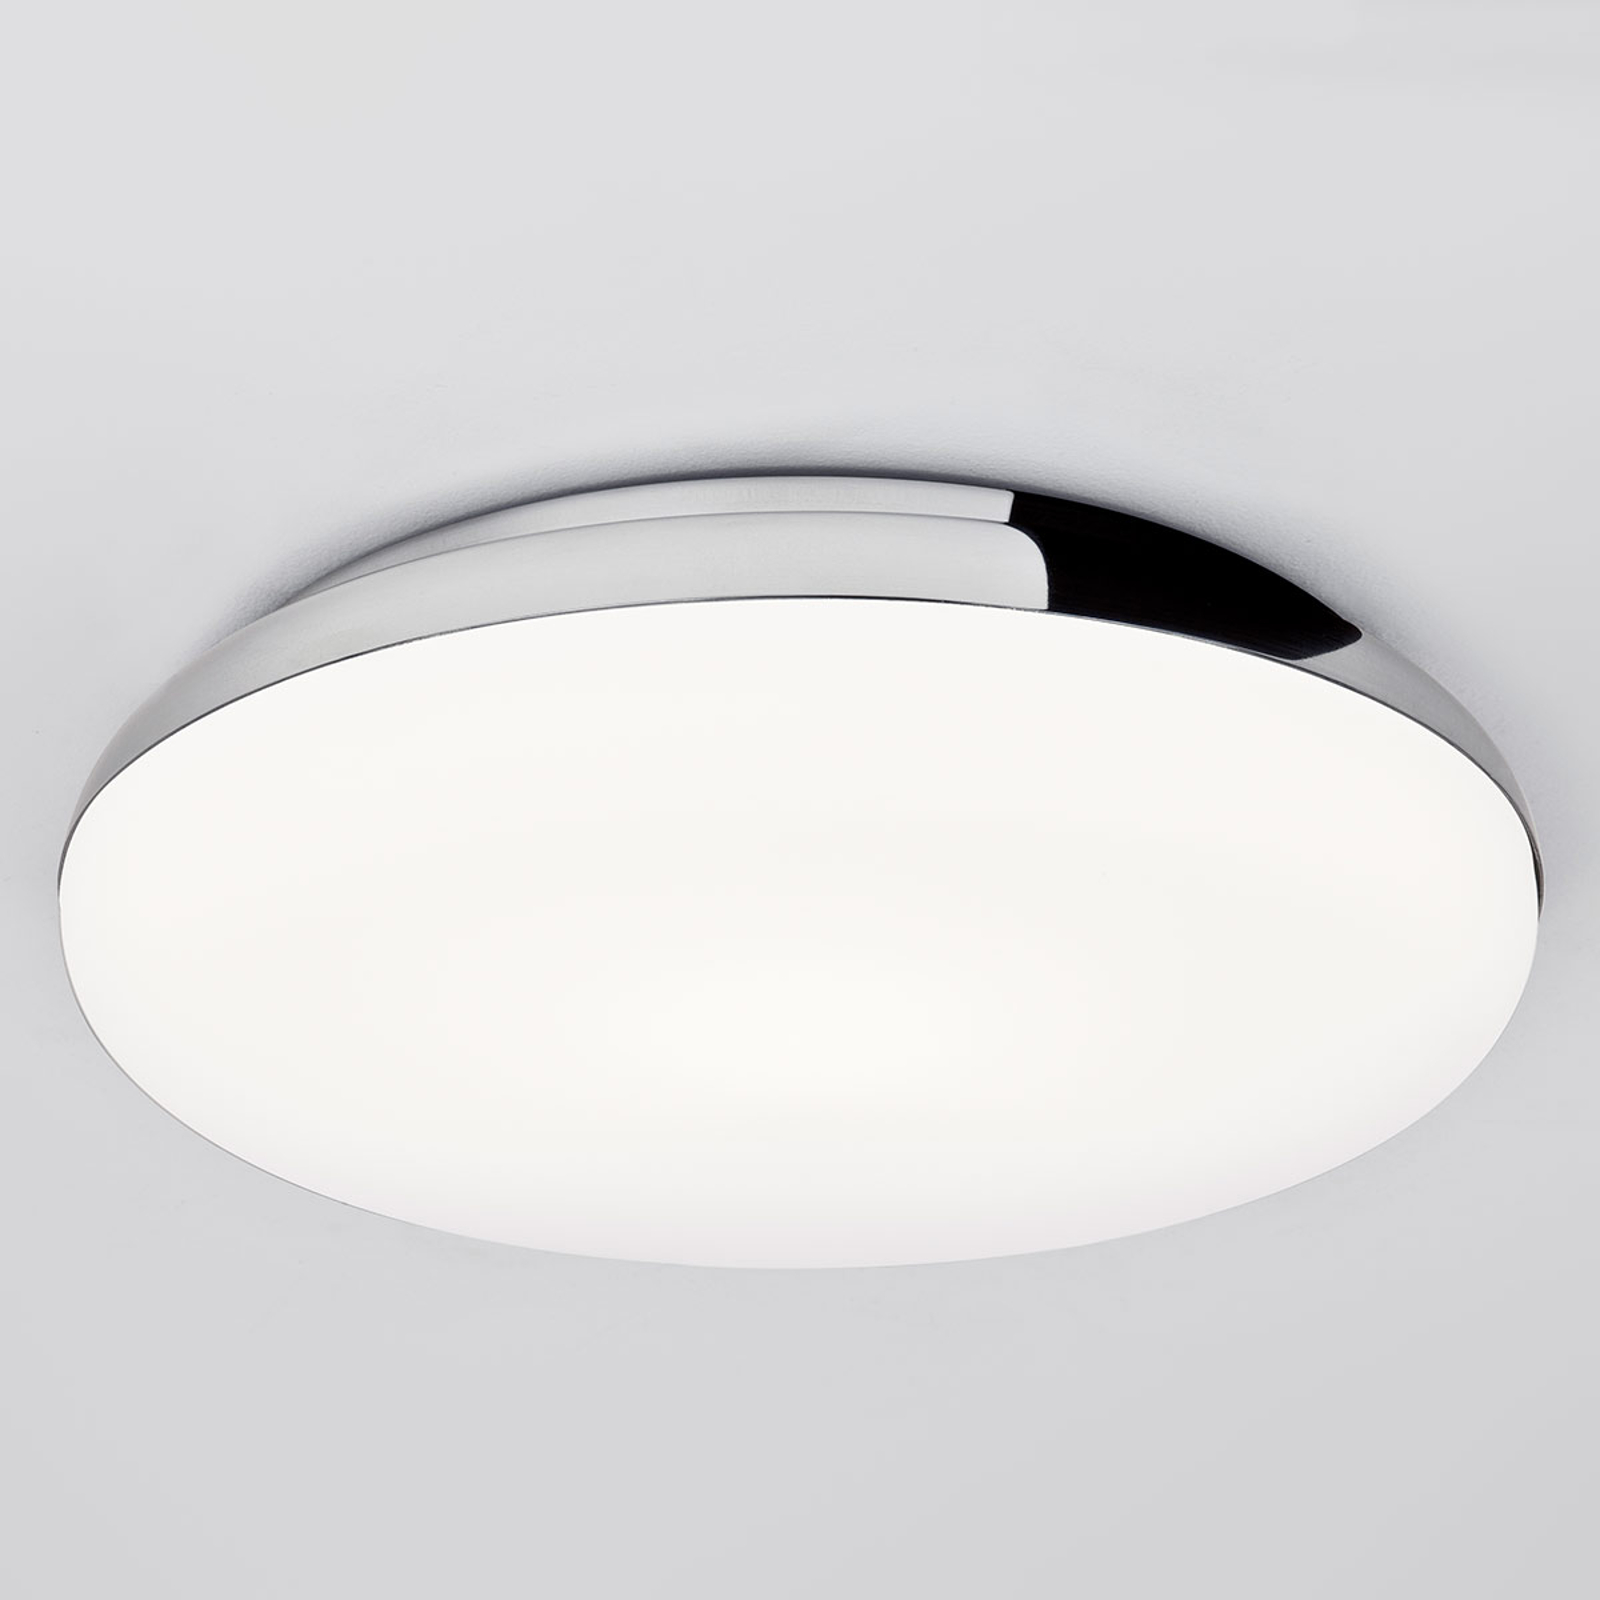 Astro Altea - plafondlamp met glas Ø 30 cm